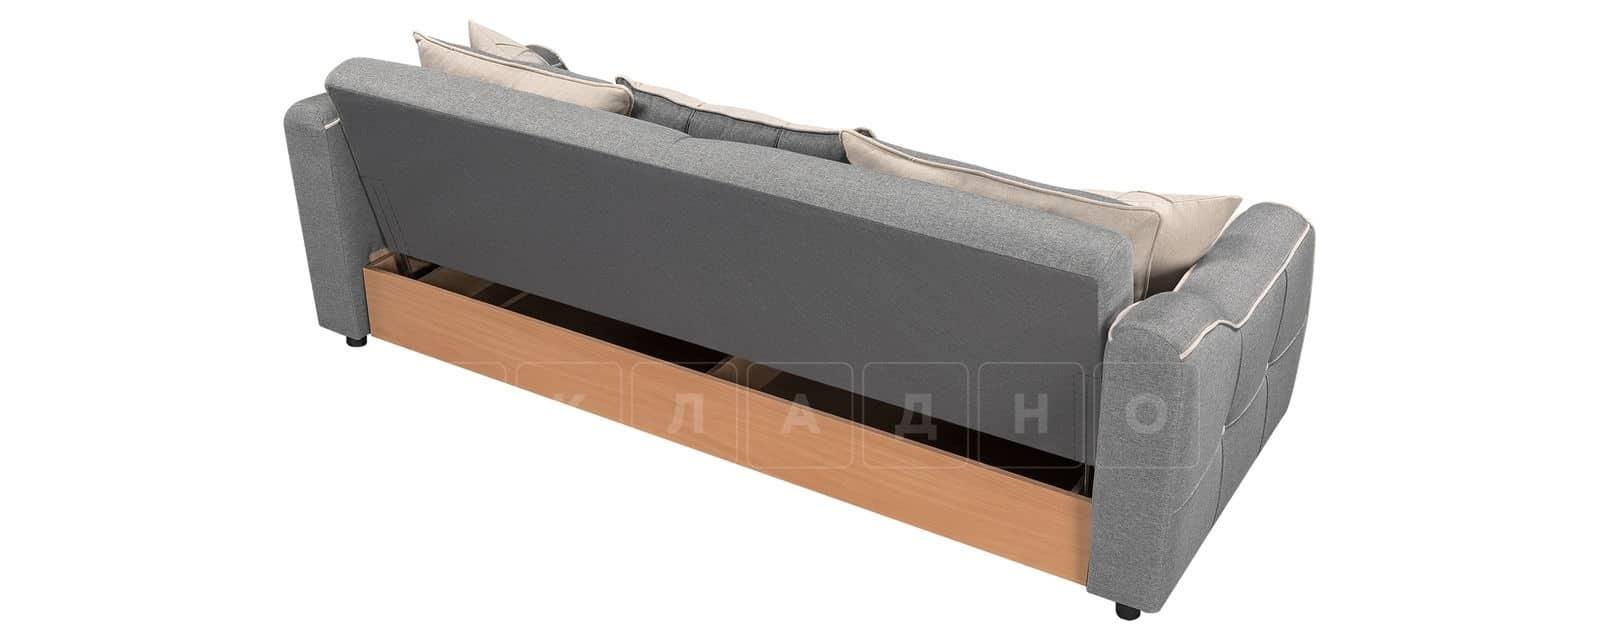 Диван Флэтфорд рогожка серый цвет фото 3 | интернет-магазин Складно